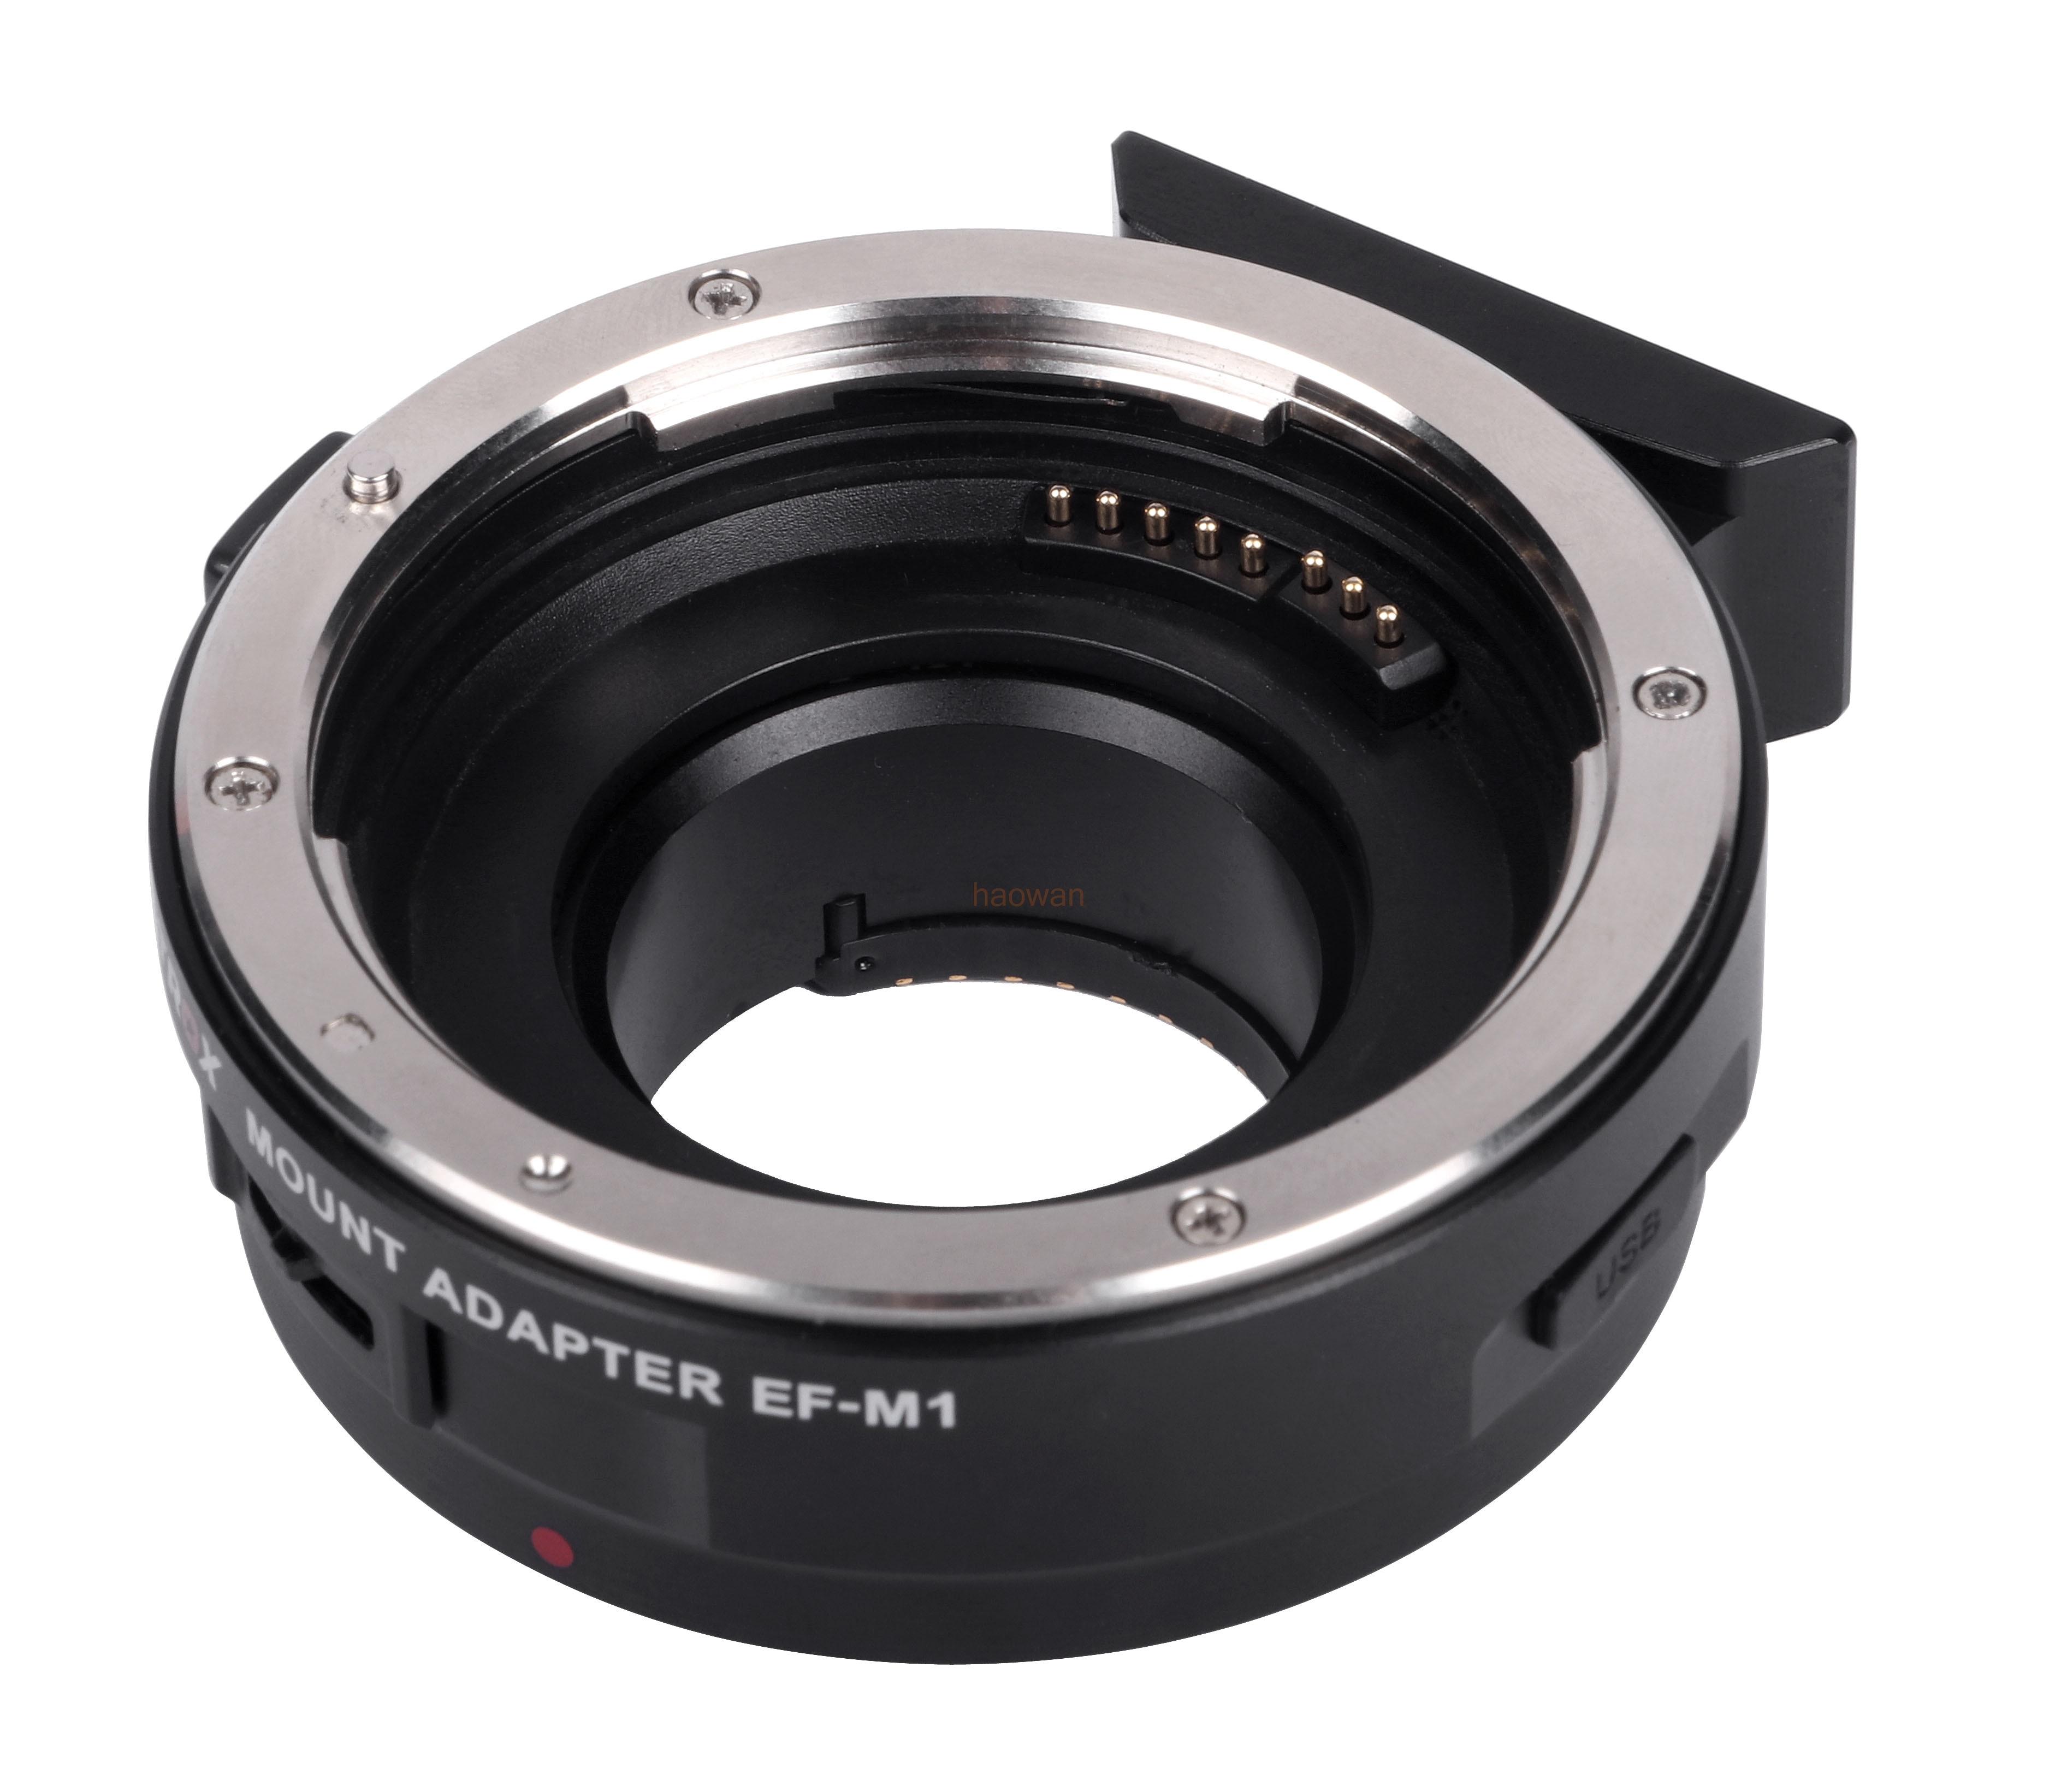 ef-m43 Auto Focus EF Lens to Micro M 4/3 M43 adjustable aperture Adapter ring for G1 G3 GH1 GH4 GM1 GX7 GF6 GF5 EM1 EM10 camera commlite cm ef mft electronic aperture control lens adapter for ef ef s lens m4 3 camera